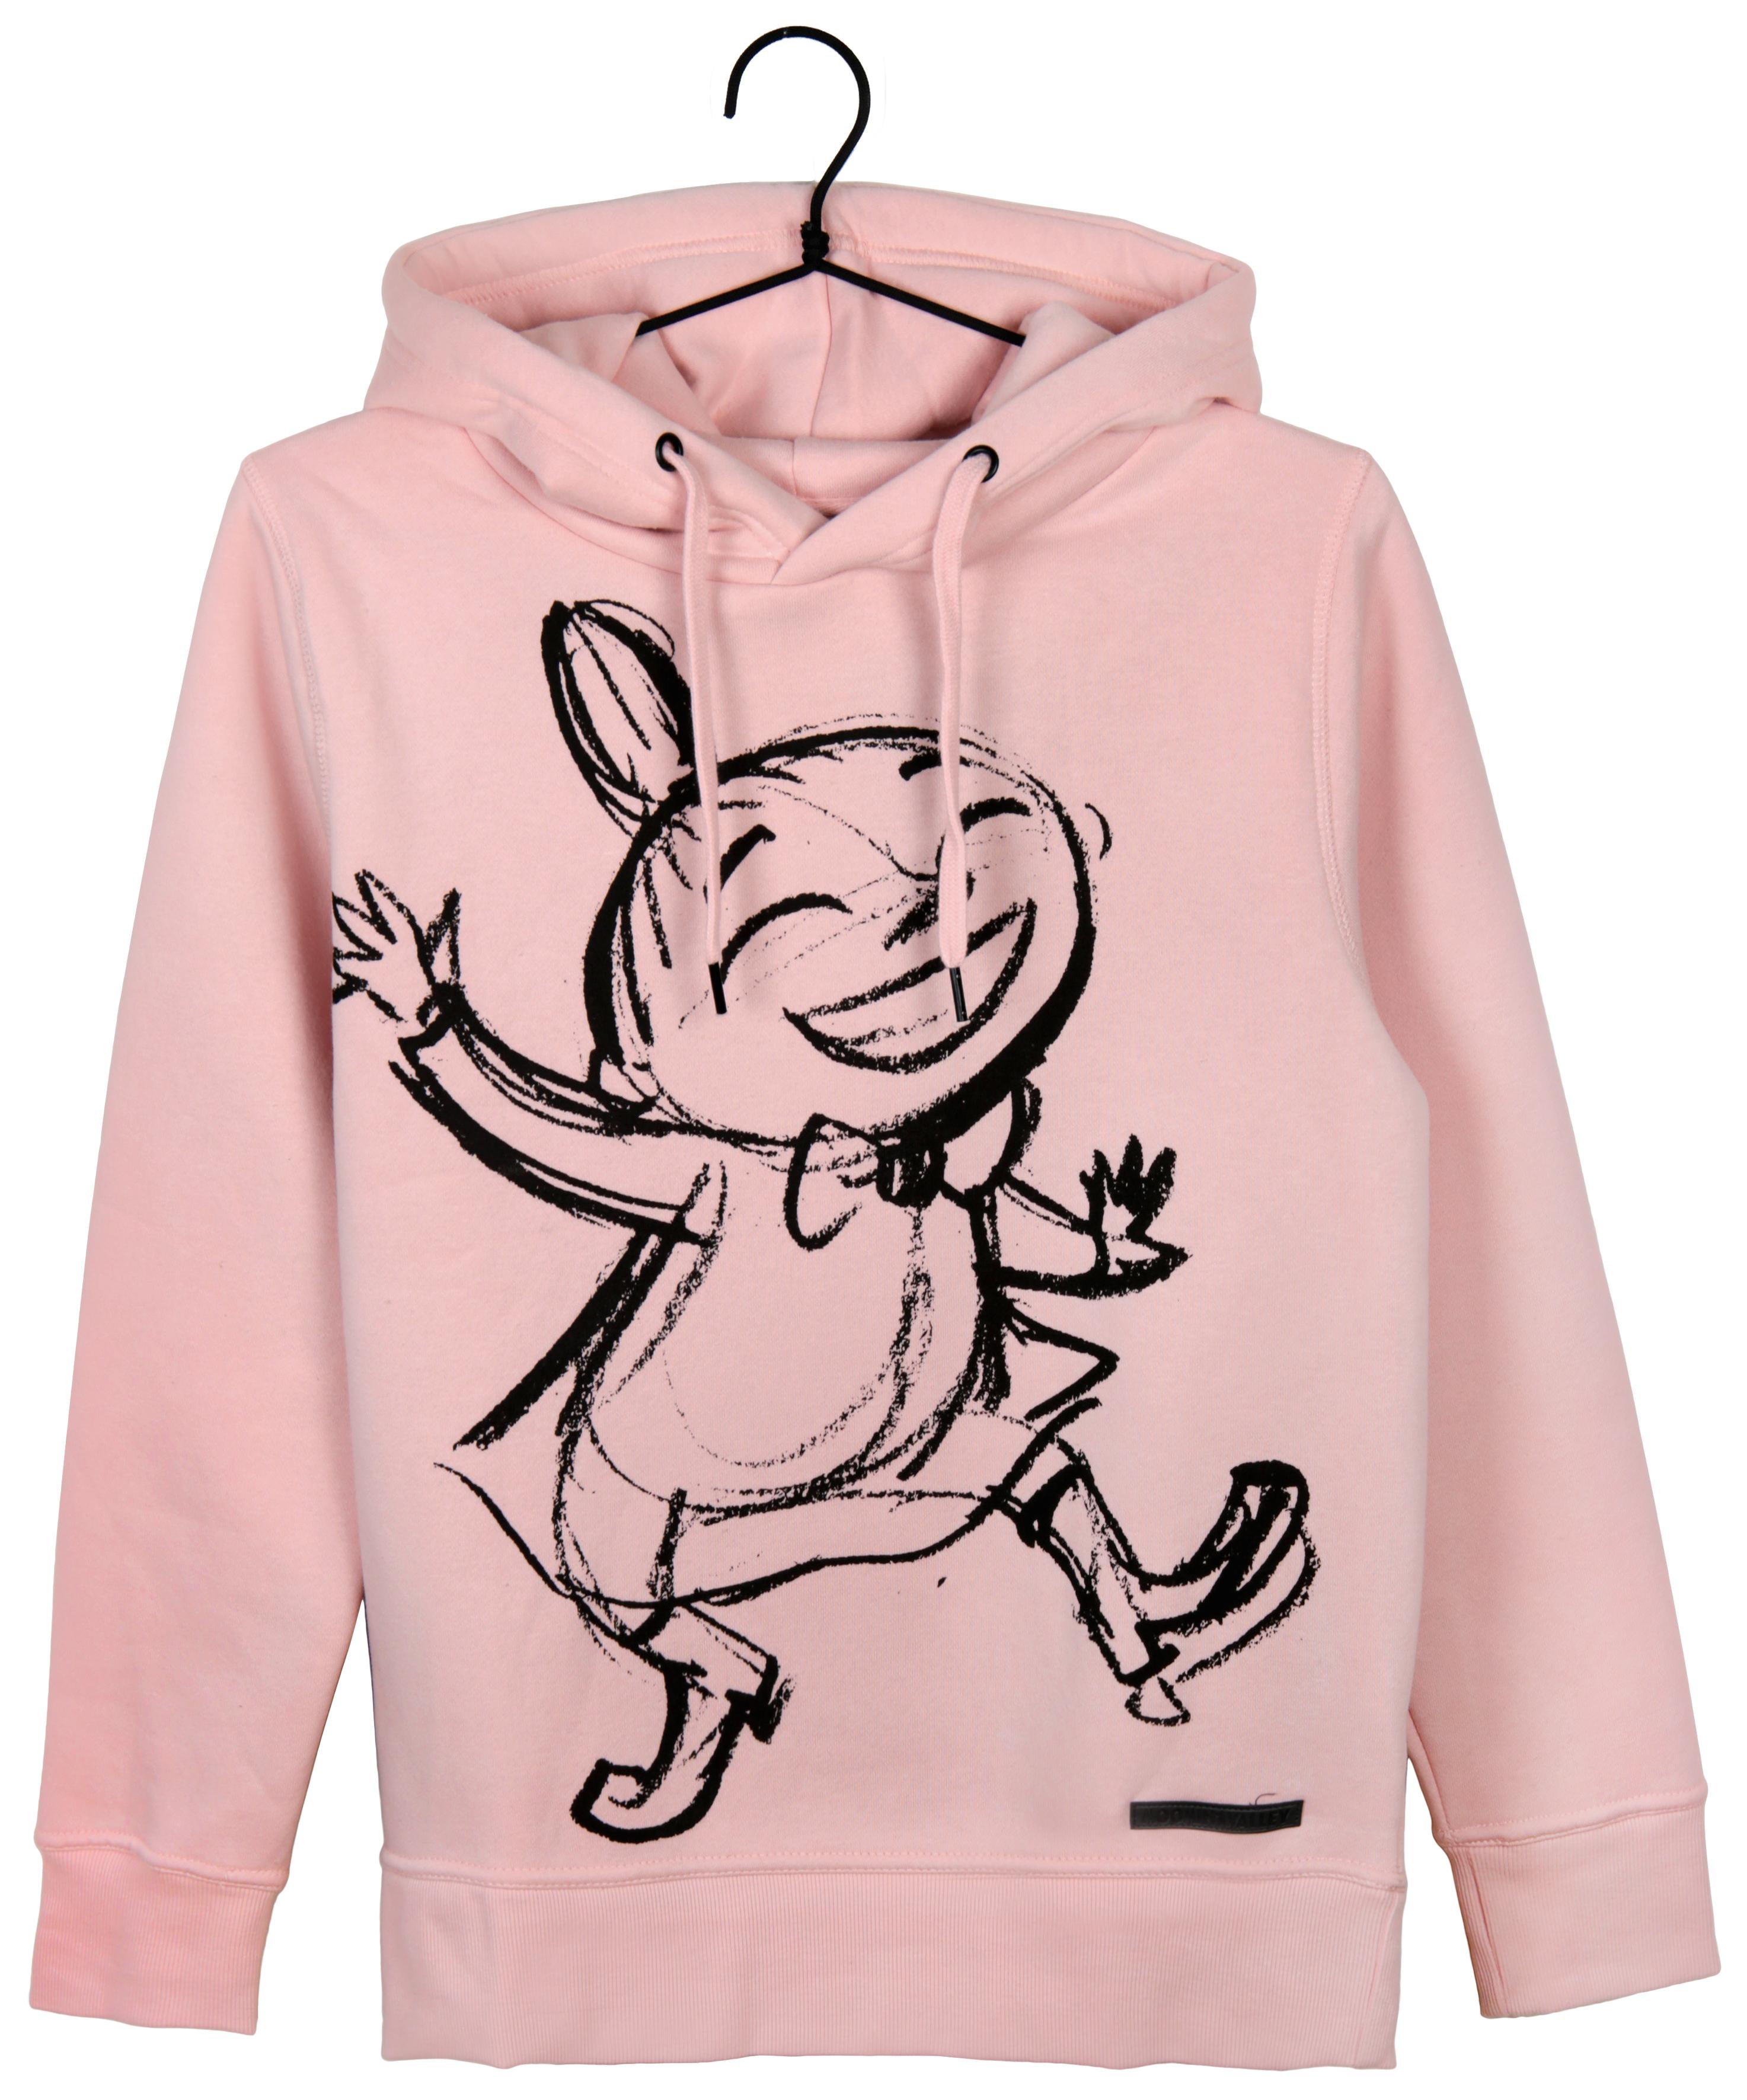 Martinex Moomin Lilli Hoodie Sketch Pink